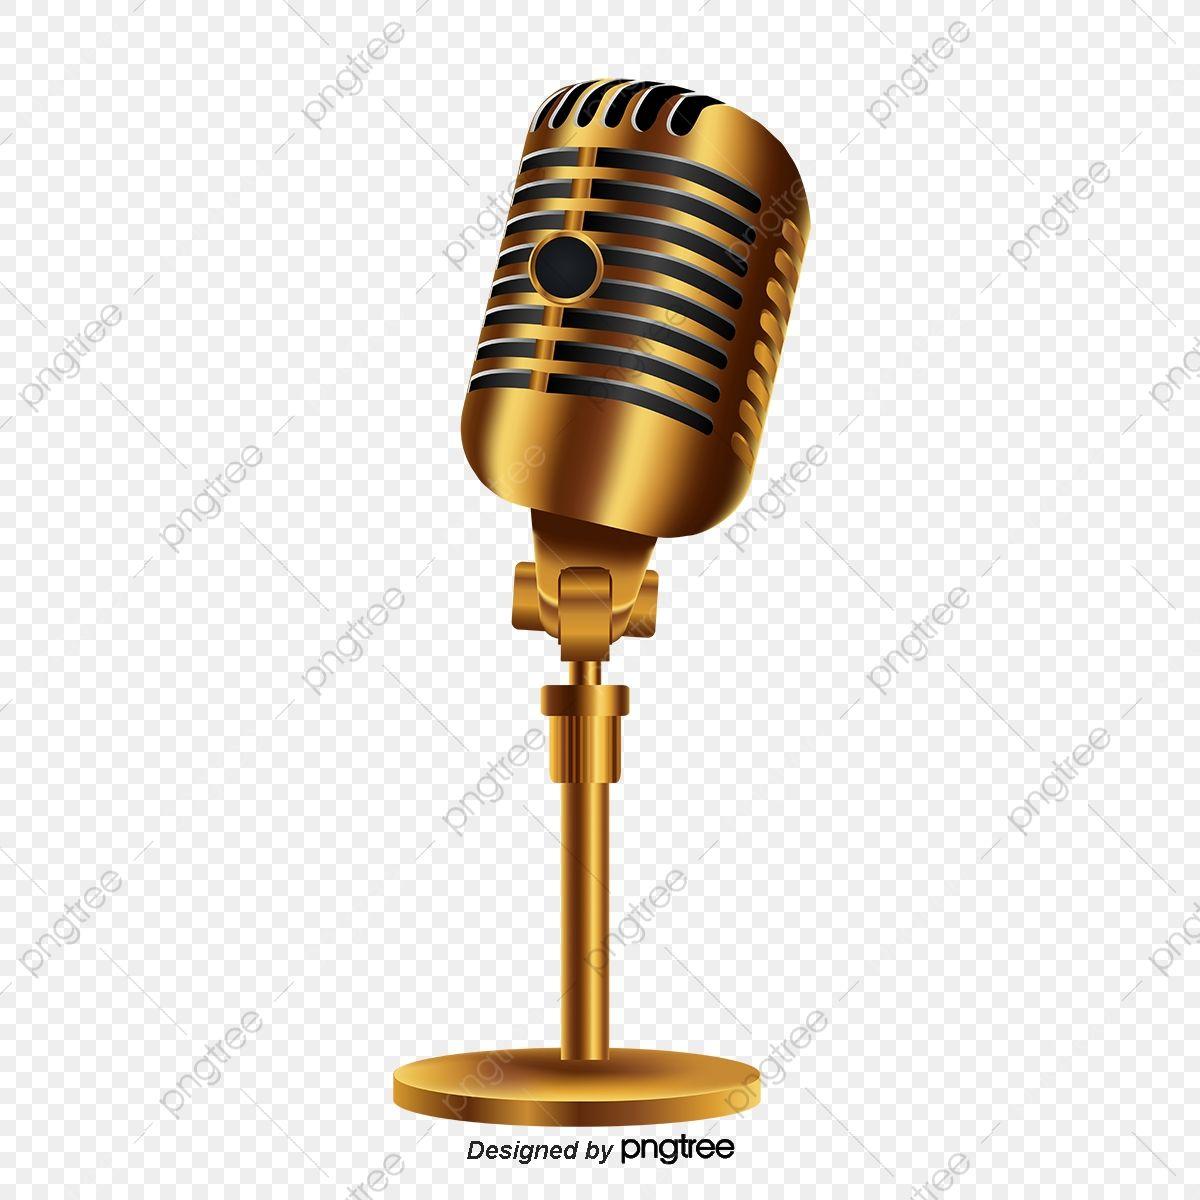 Microfono Microfono Microfono Microfono Png Y Vector Para Descargar Gratis Pngtree In 2021 Location Icon Classic Gold Icon Design